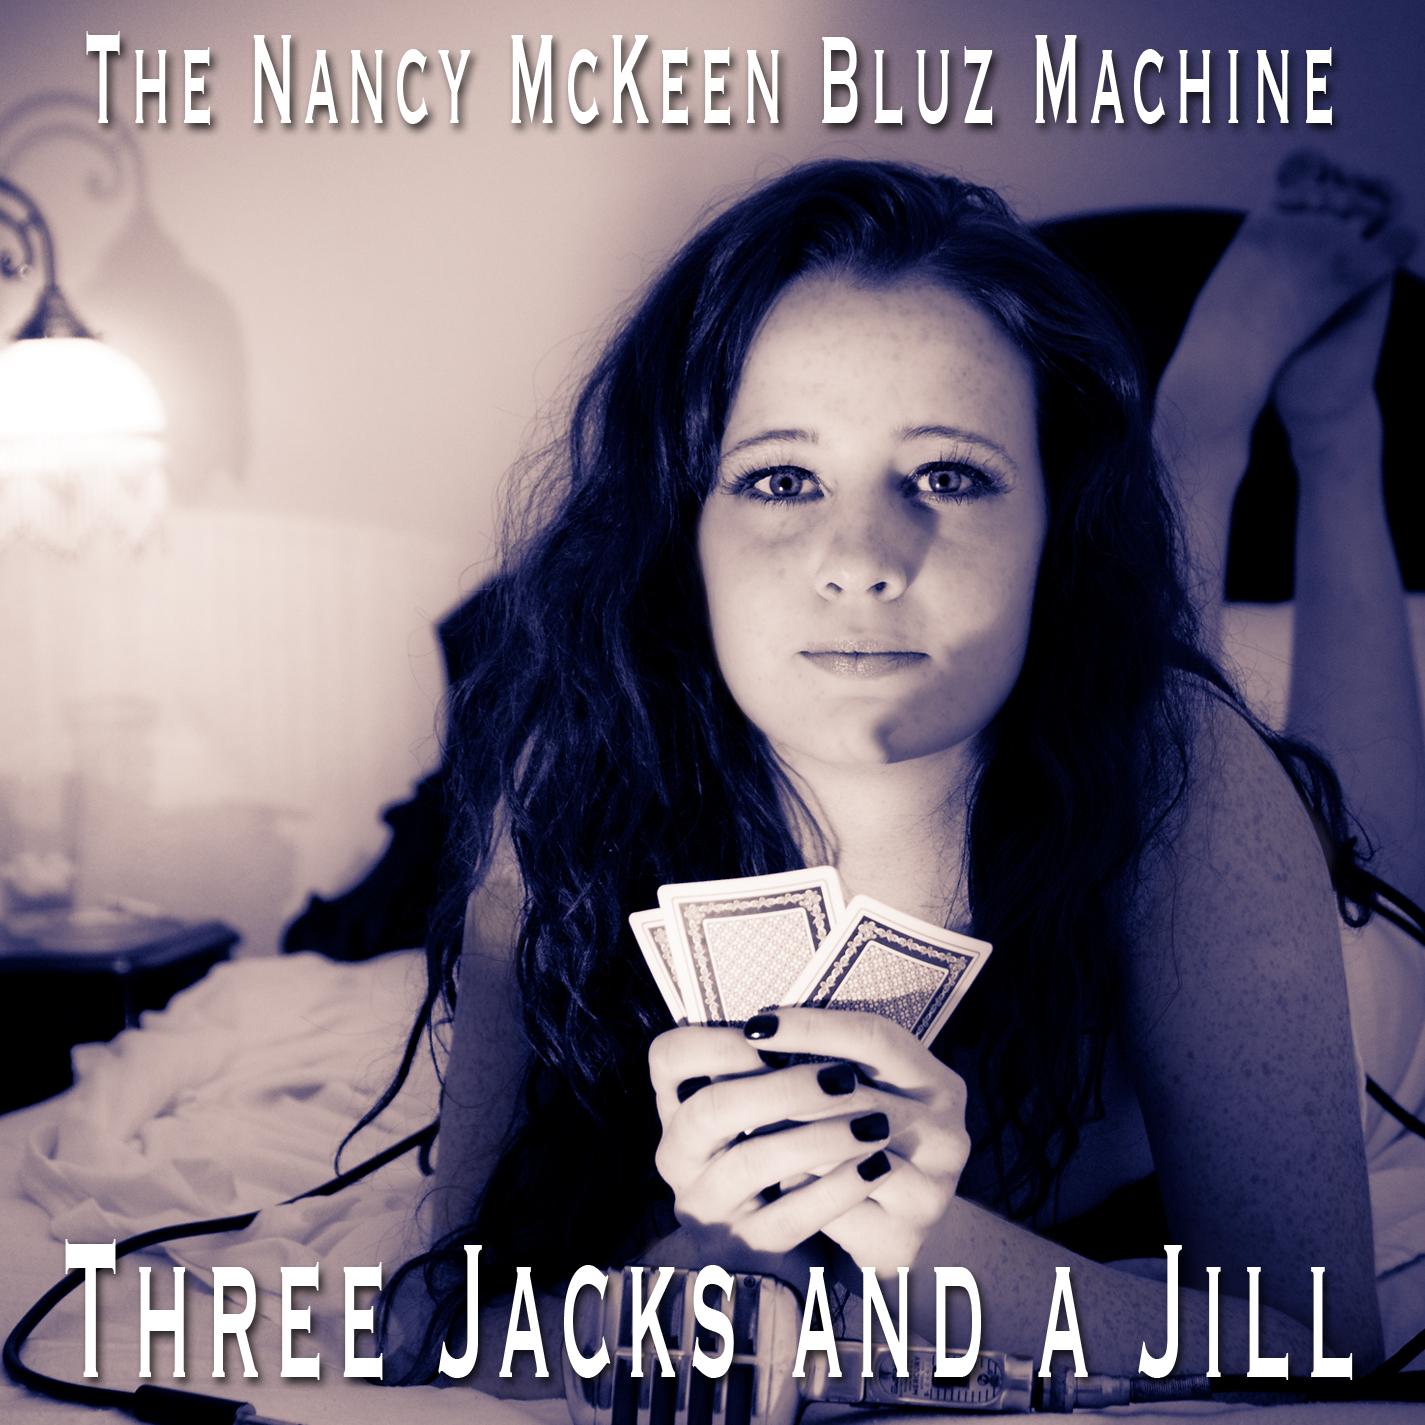 http://3.bp.blogspot.com/-jNYgzuGNP9I/ThEEaNVaKBI/AAAAAAAAAI8/mwPozerqa_Q/s1600/Three+Jacks+and+a+Jill+-+Front.jpg